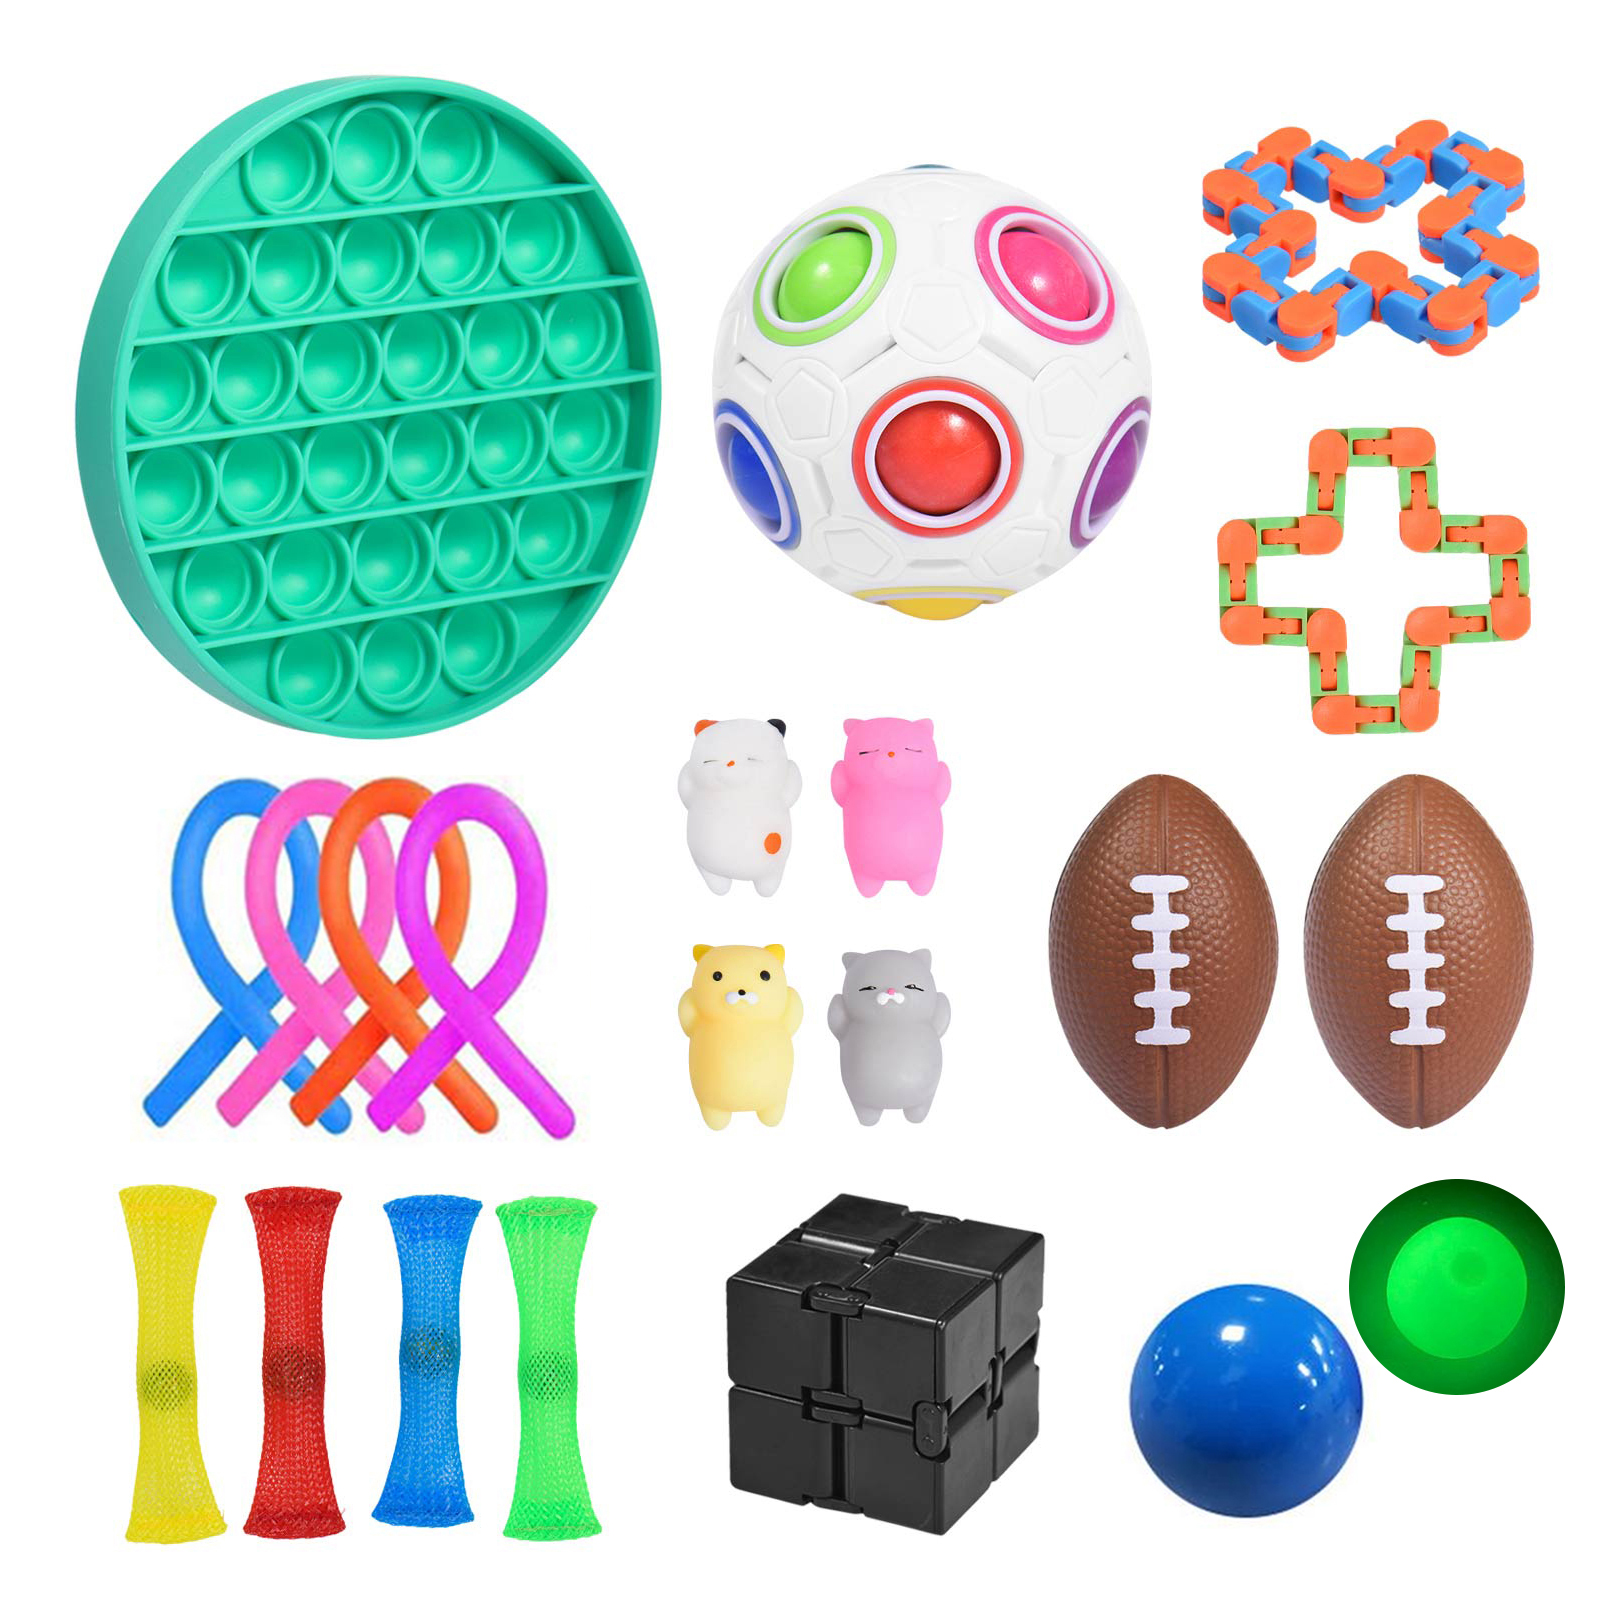 Fidget Sensory Toy Set Stress Relief Toys Autism Anxiety Relief Stress Pop Bubble Fidget img2